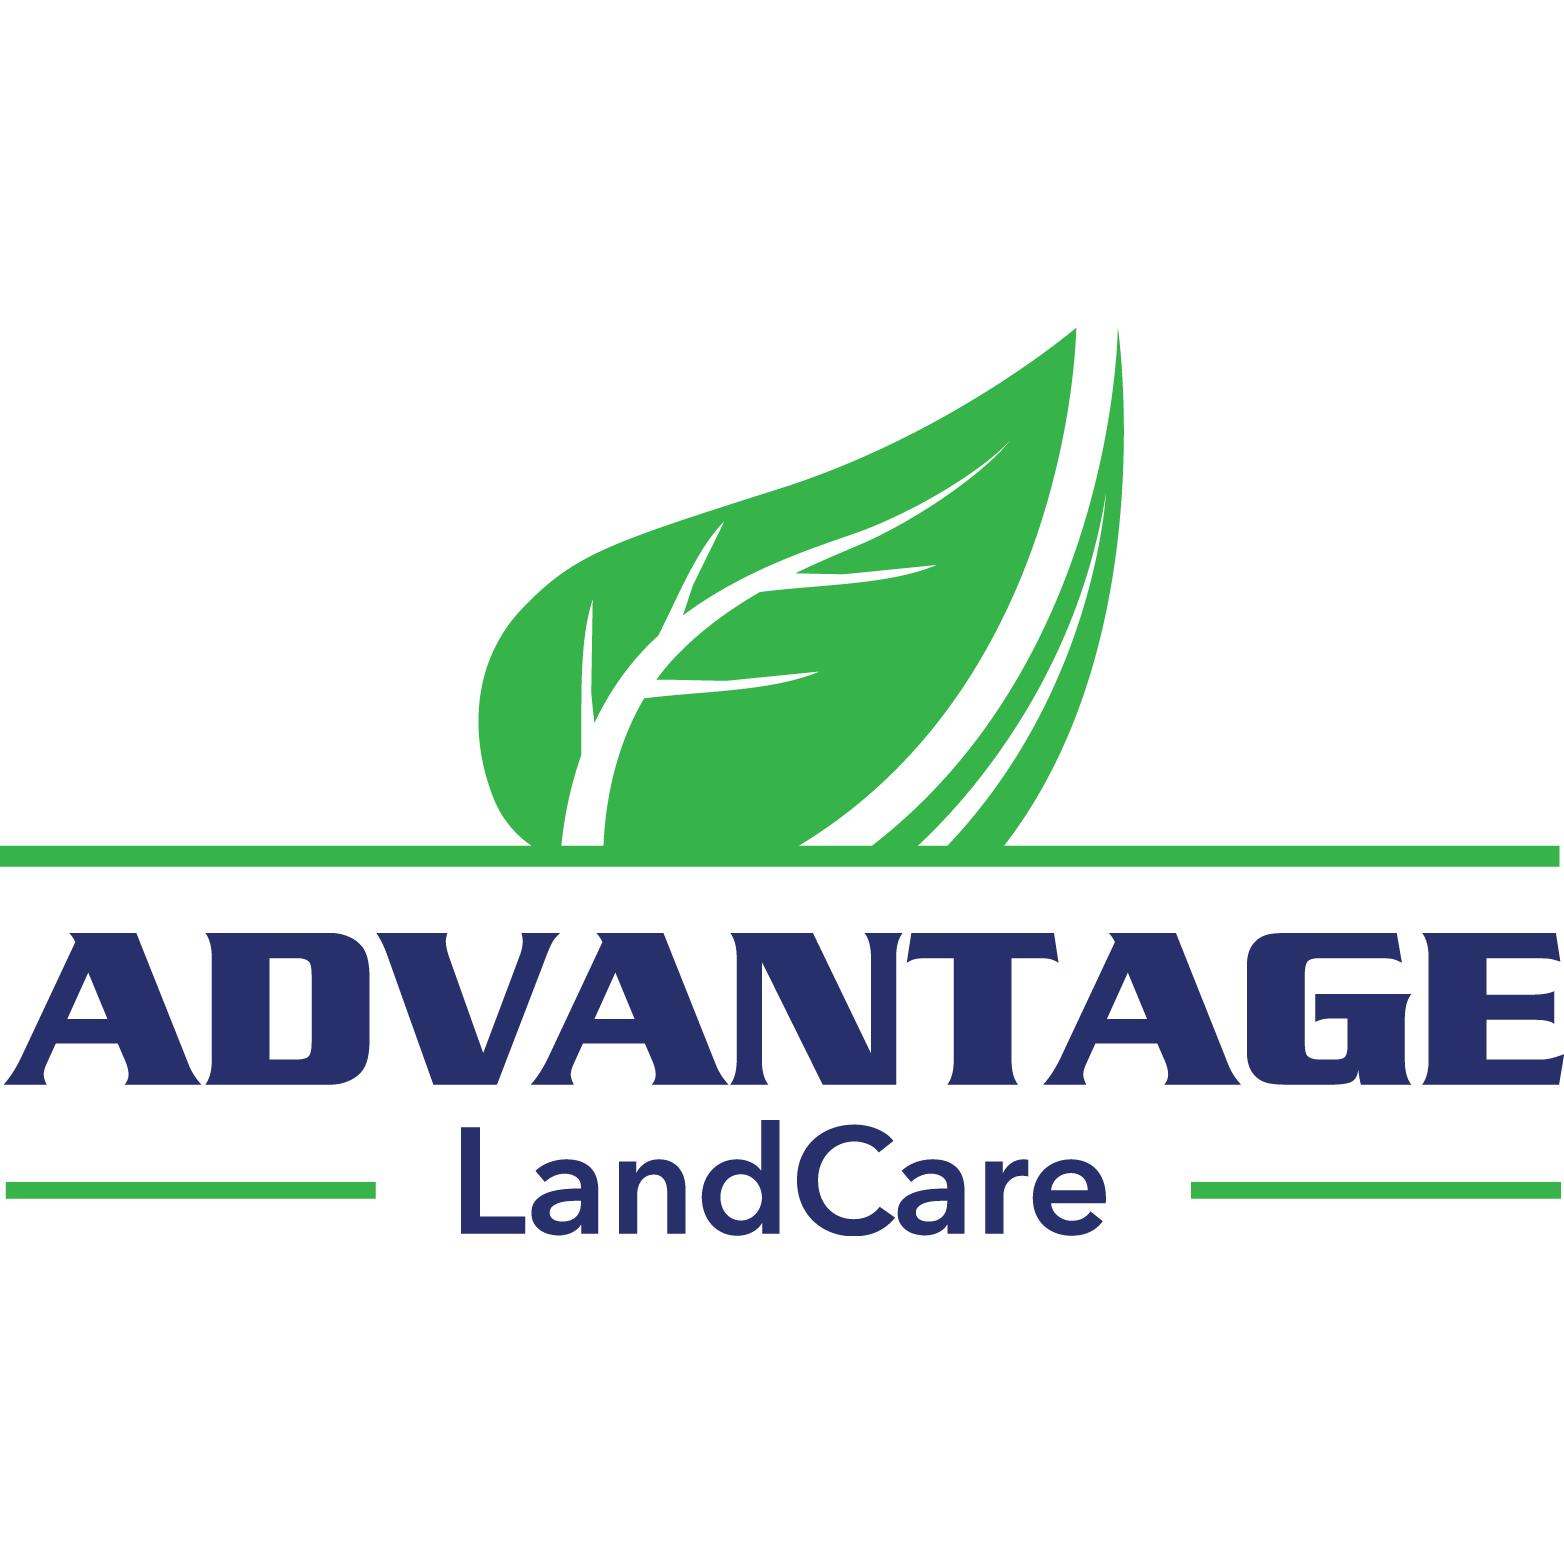 Advantage LandCare